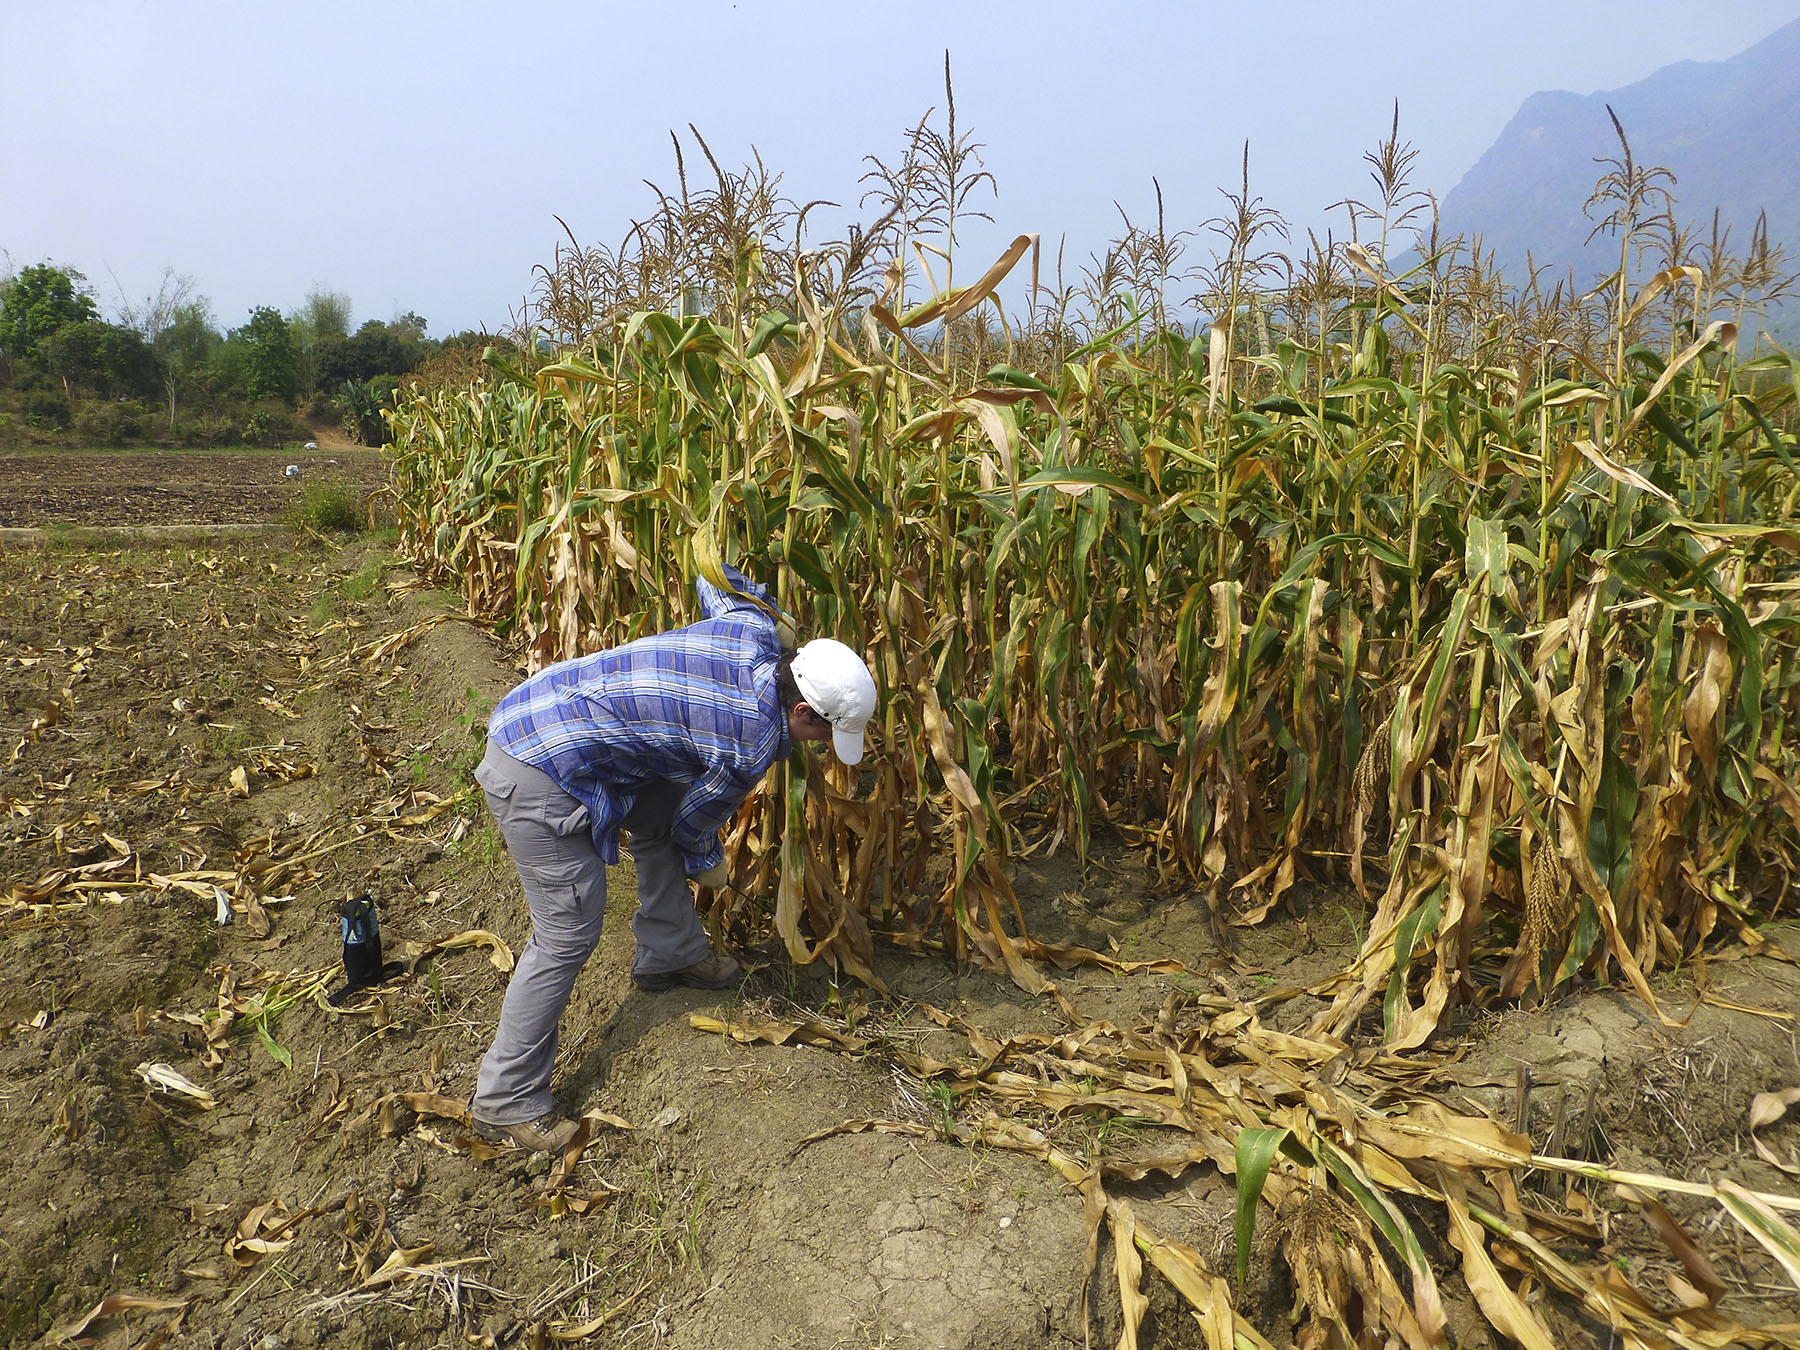 Cutting Corn Stalks